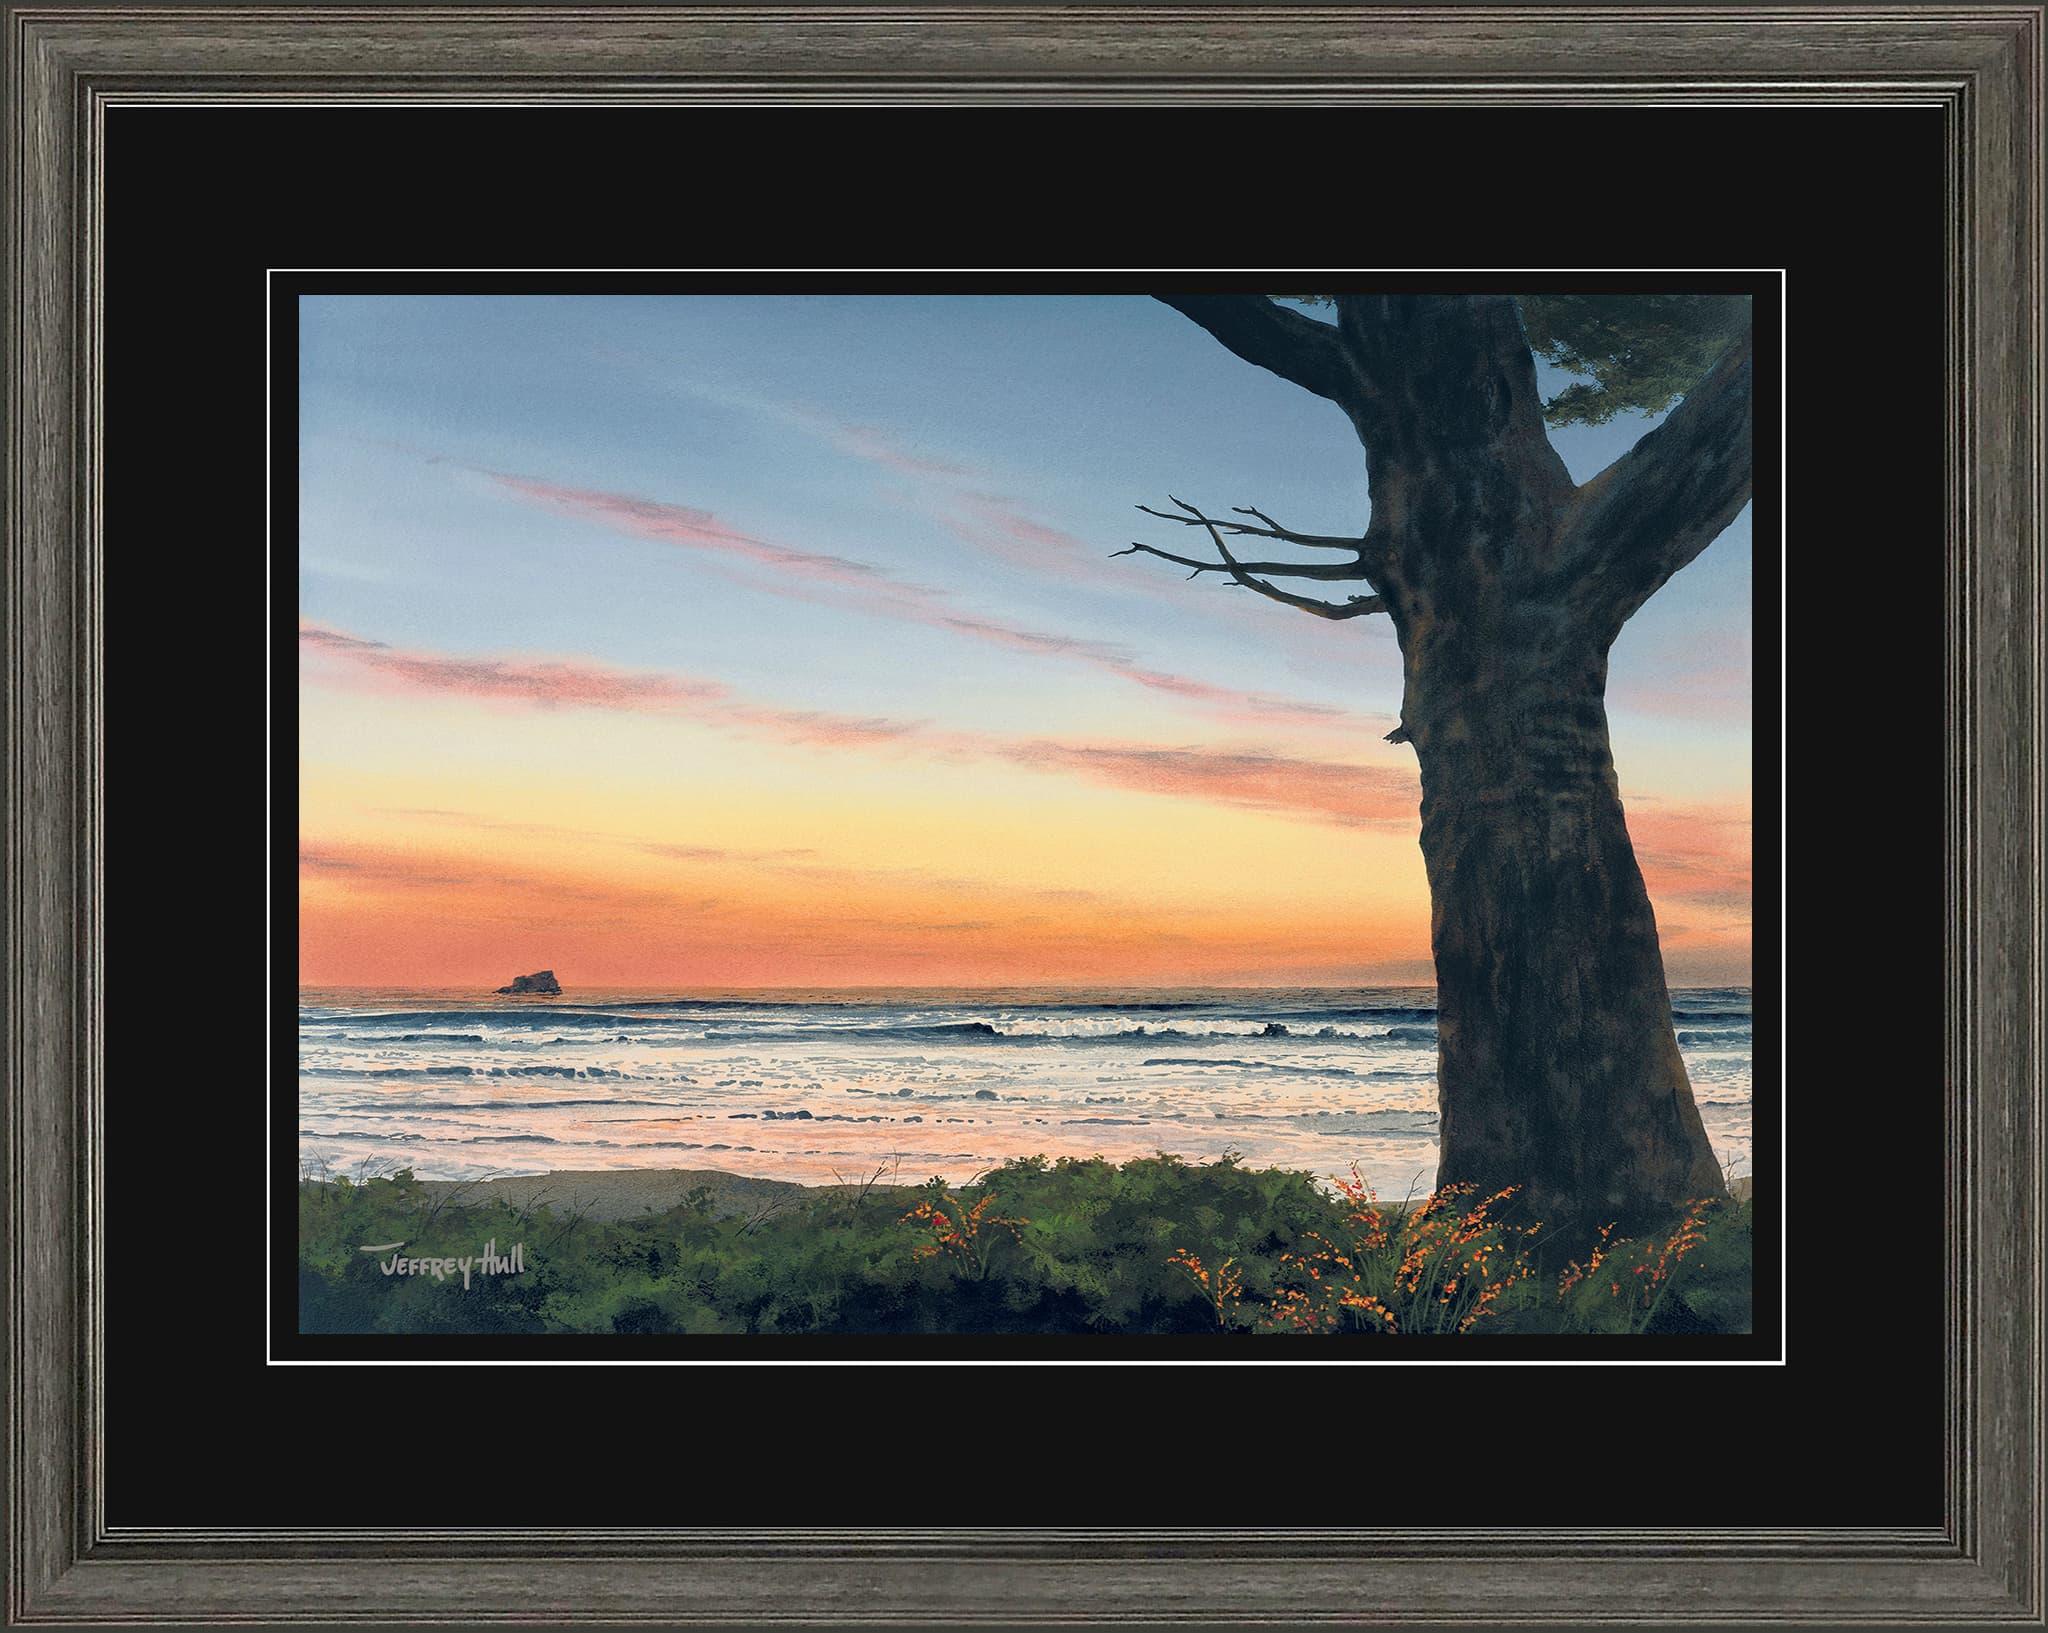 Sunset-Overlook-LimEd-Cascade-Jet-Black-4-Website-2021